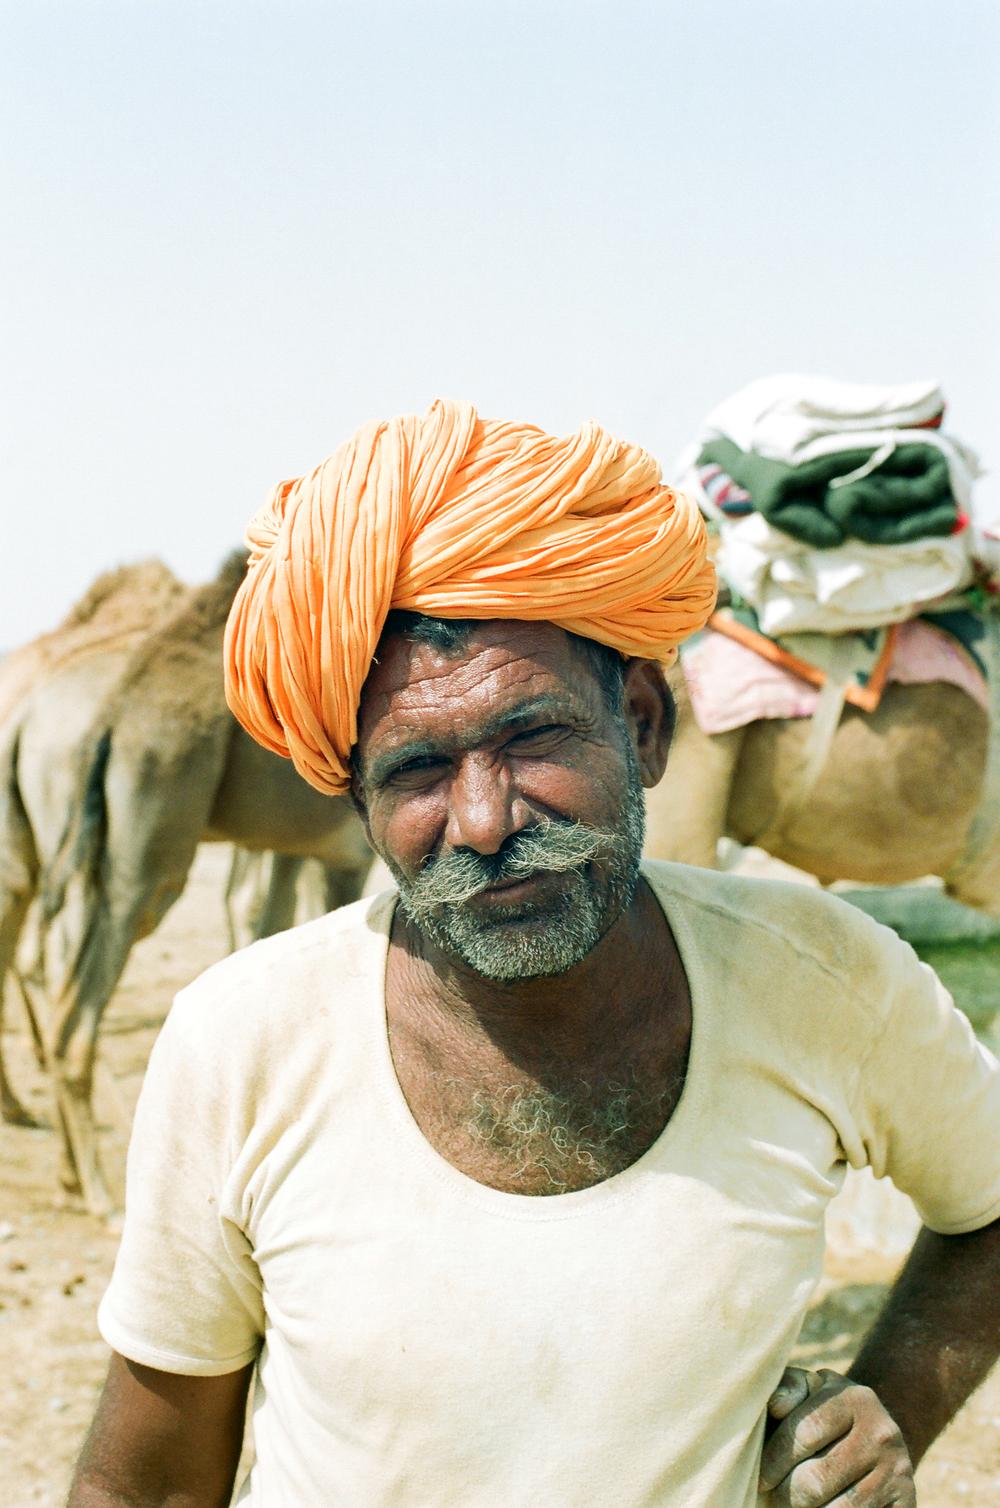 DHANANA, INDIA